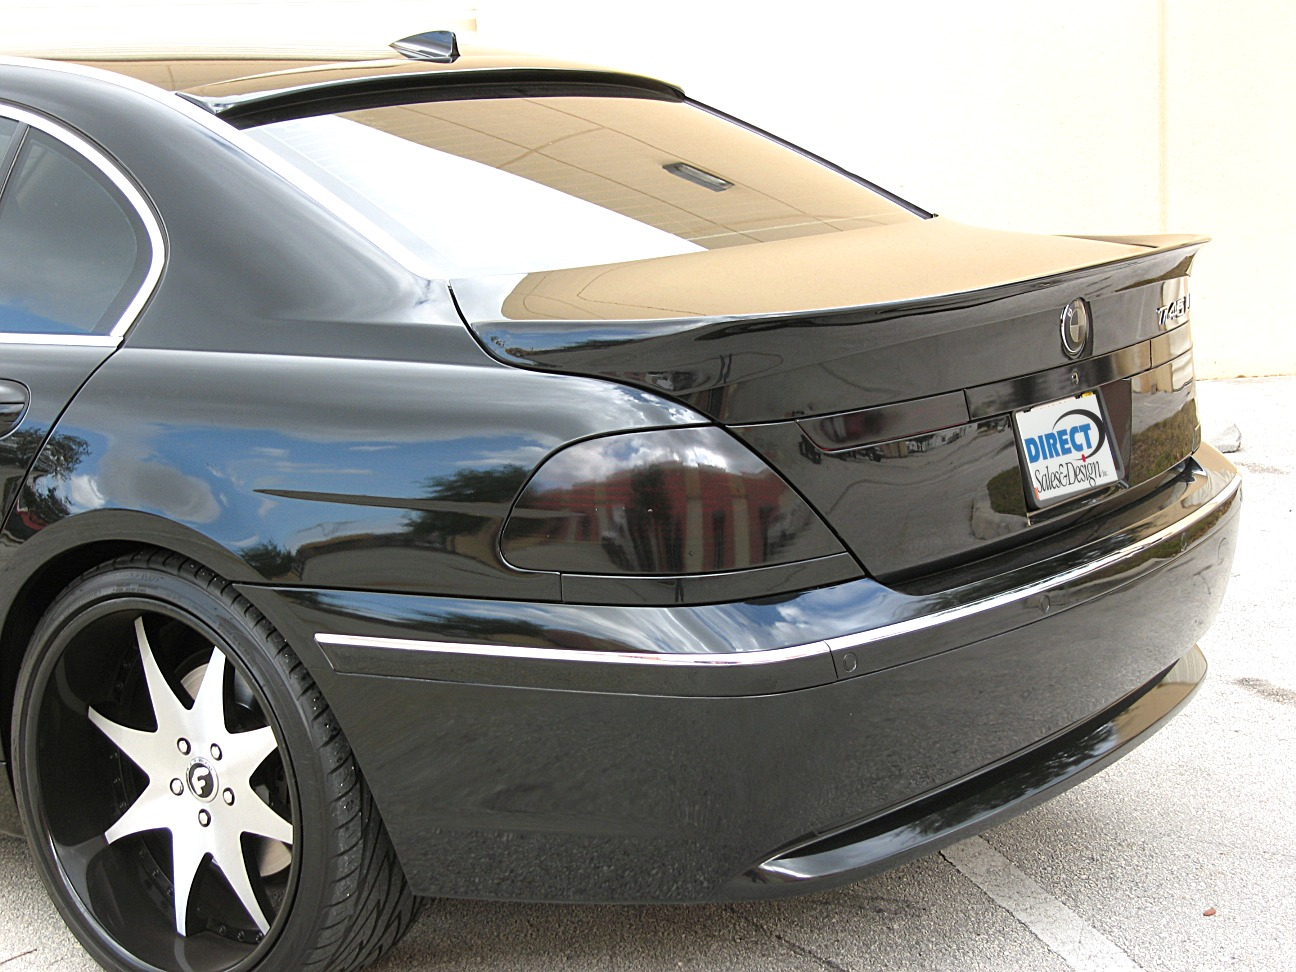 2002 2005 bmw 7 series alpina style rear lip spoiler. Black Bedroom Furniture Sets. Home Design Ideas